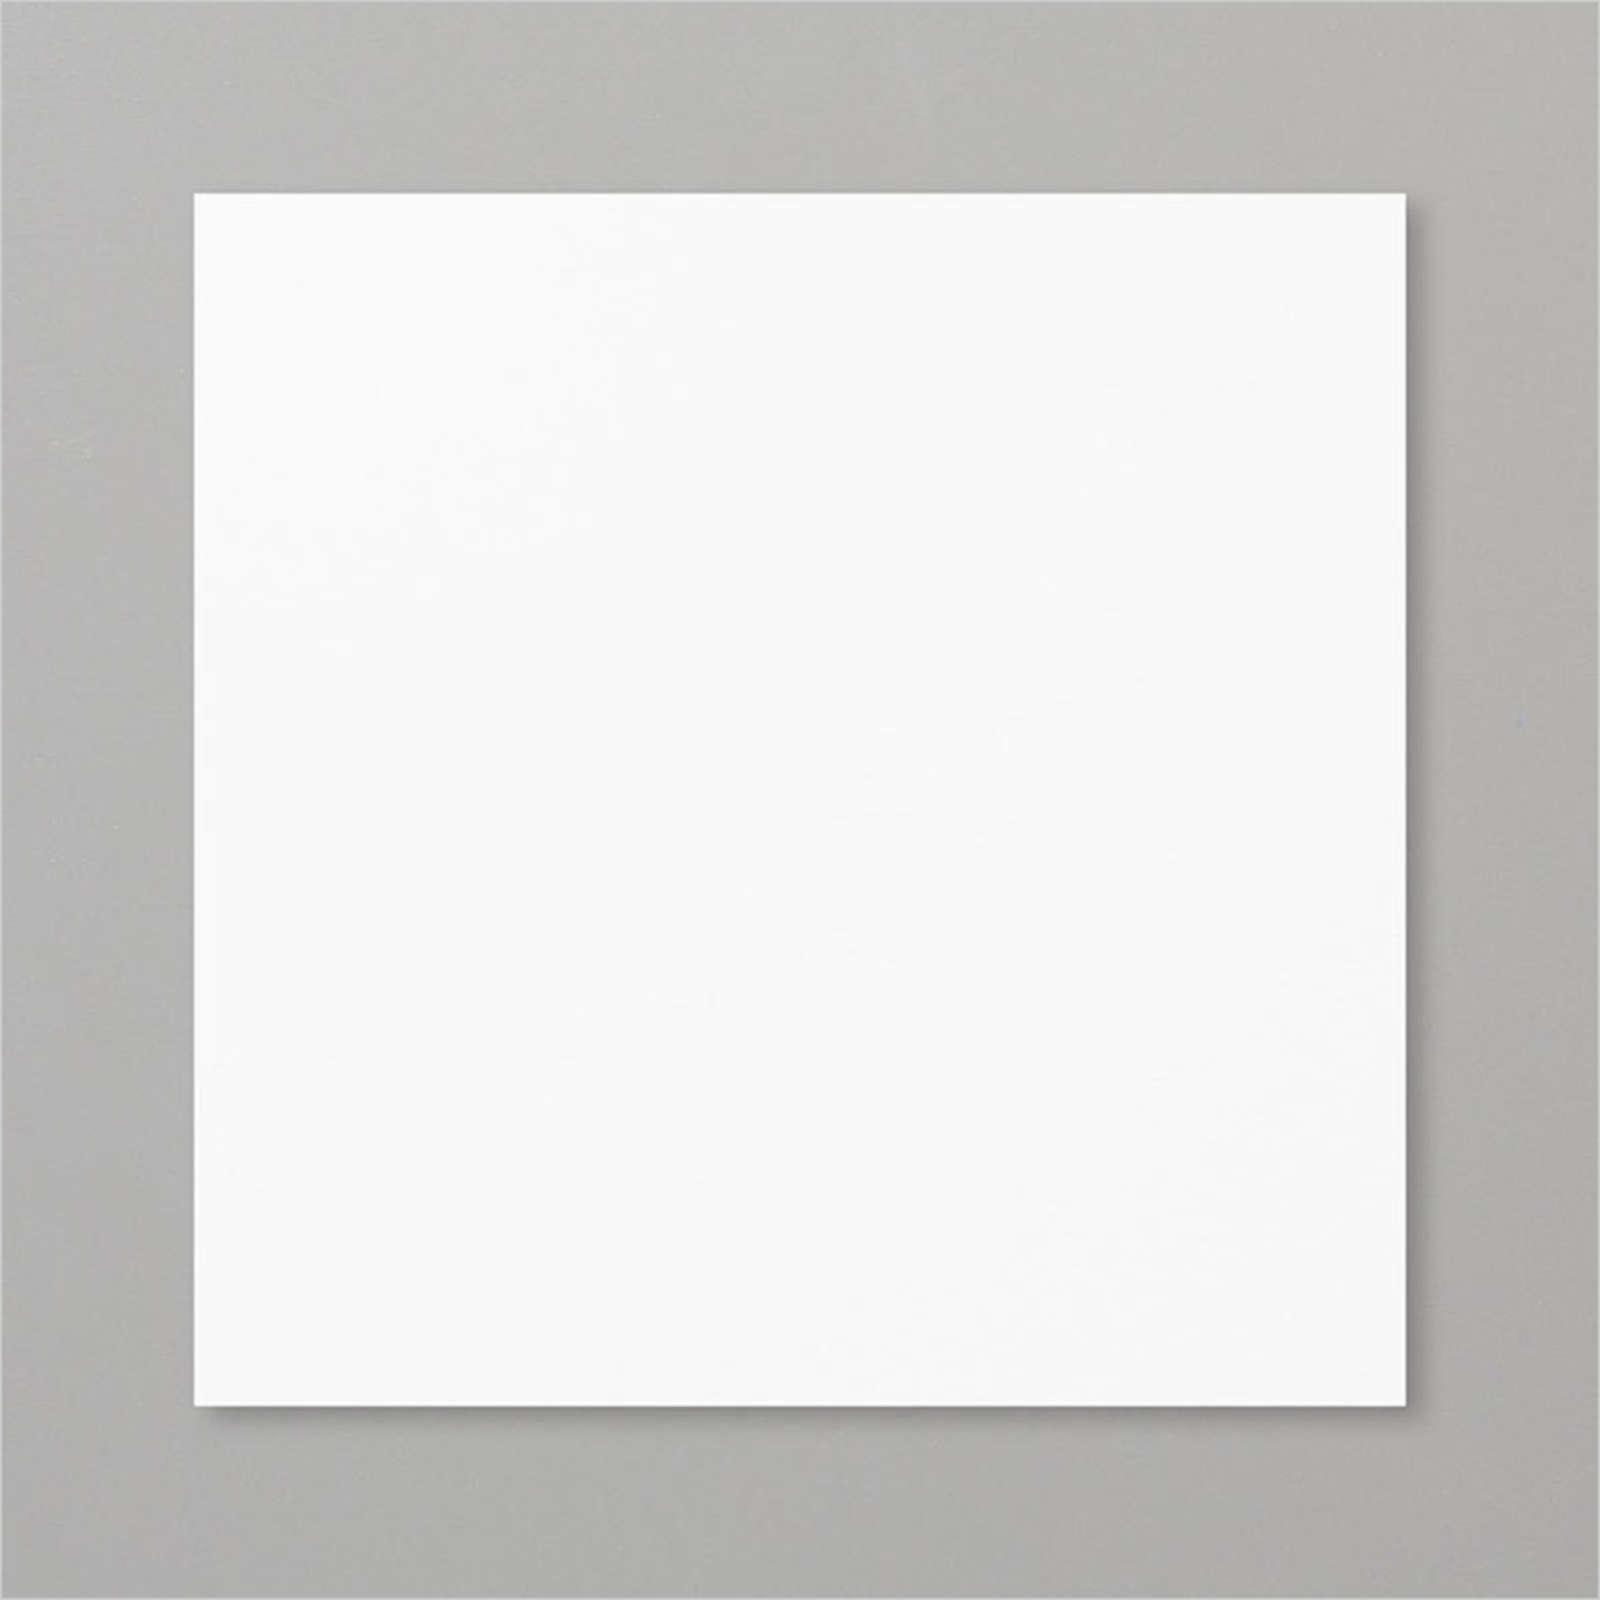 "WHISPER WHITE 12"" X 12"" (30,5 X 30,5 CM) CARDSTOCK"